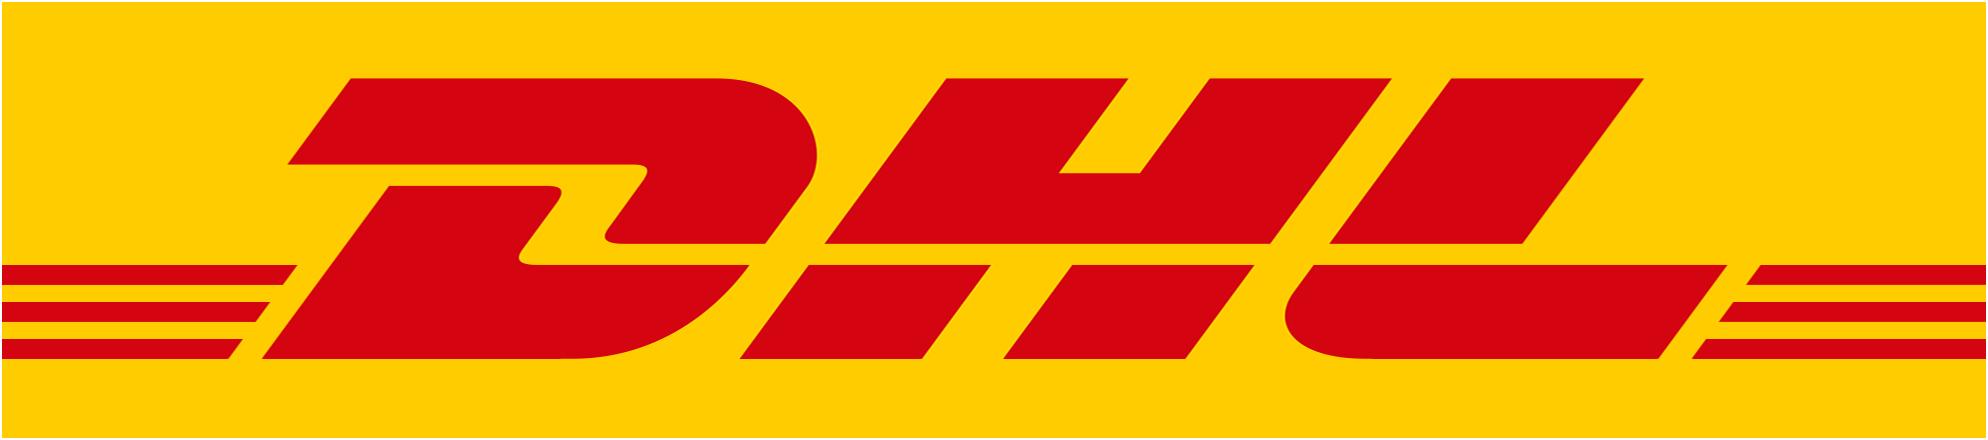 DHL_logo 2017